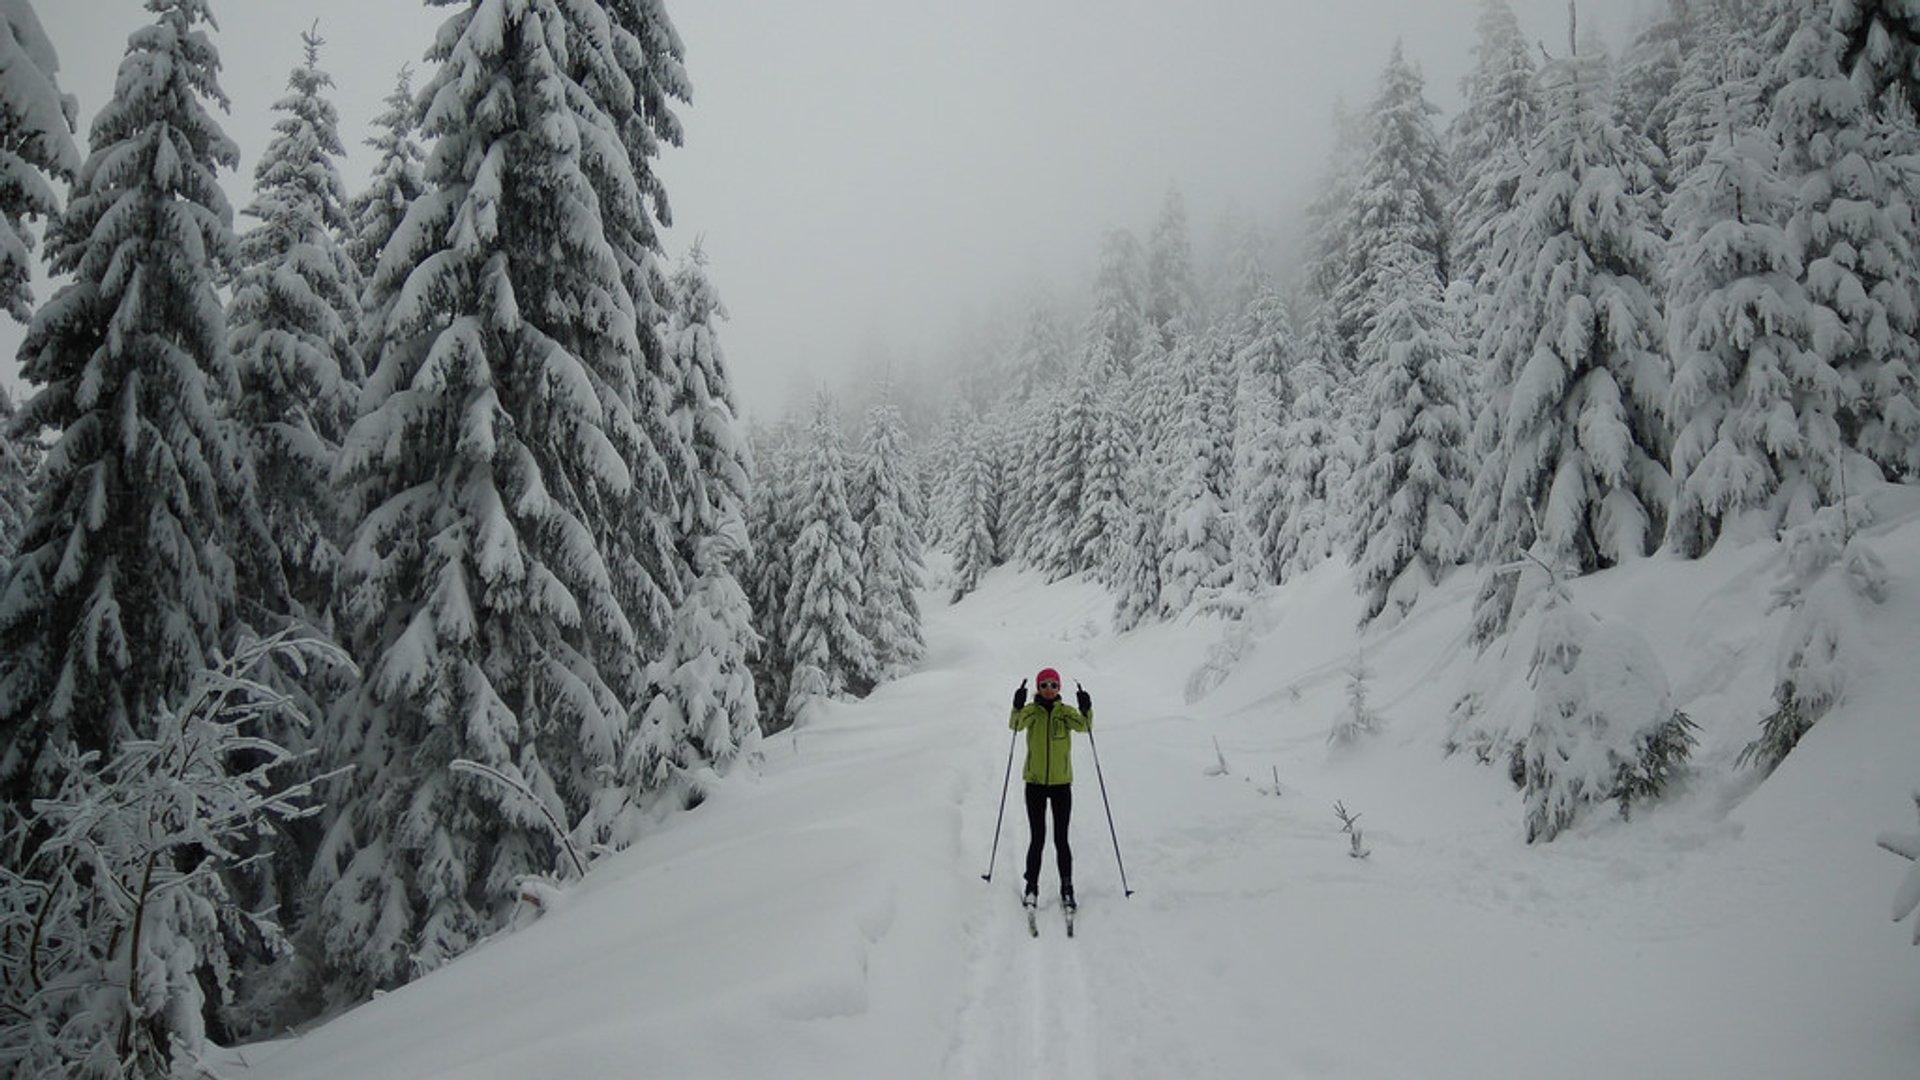 Horni Halze, near Klínovec 2019